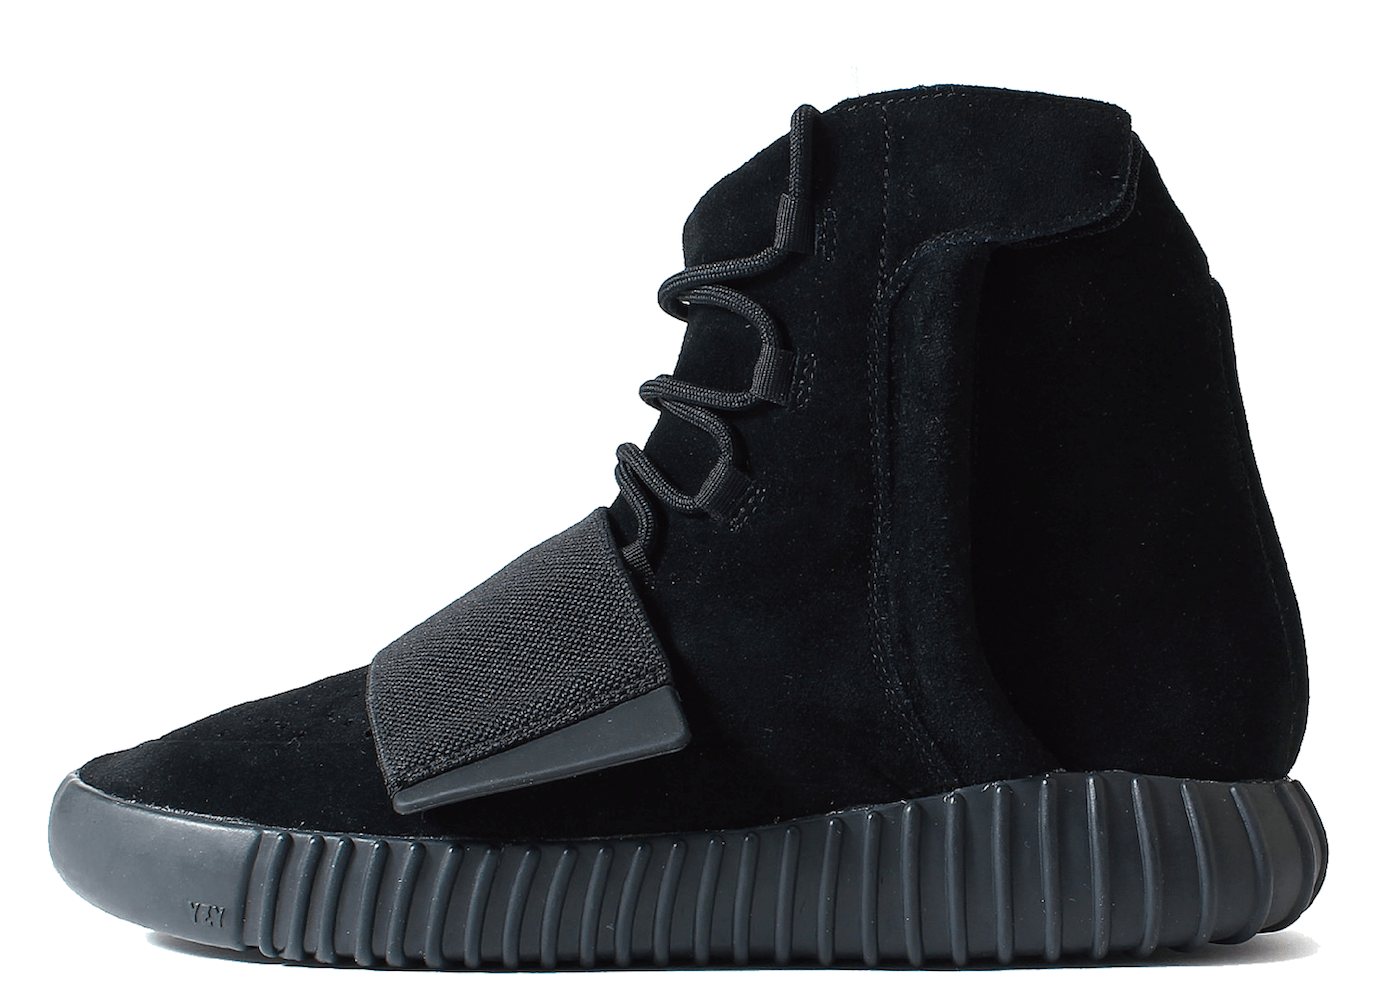 Adidas Yeezy Boost 750 Triple Blackの写真